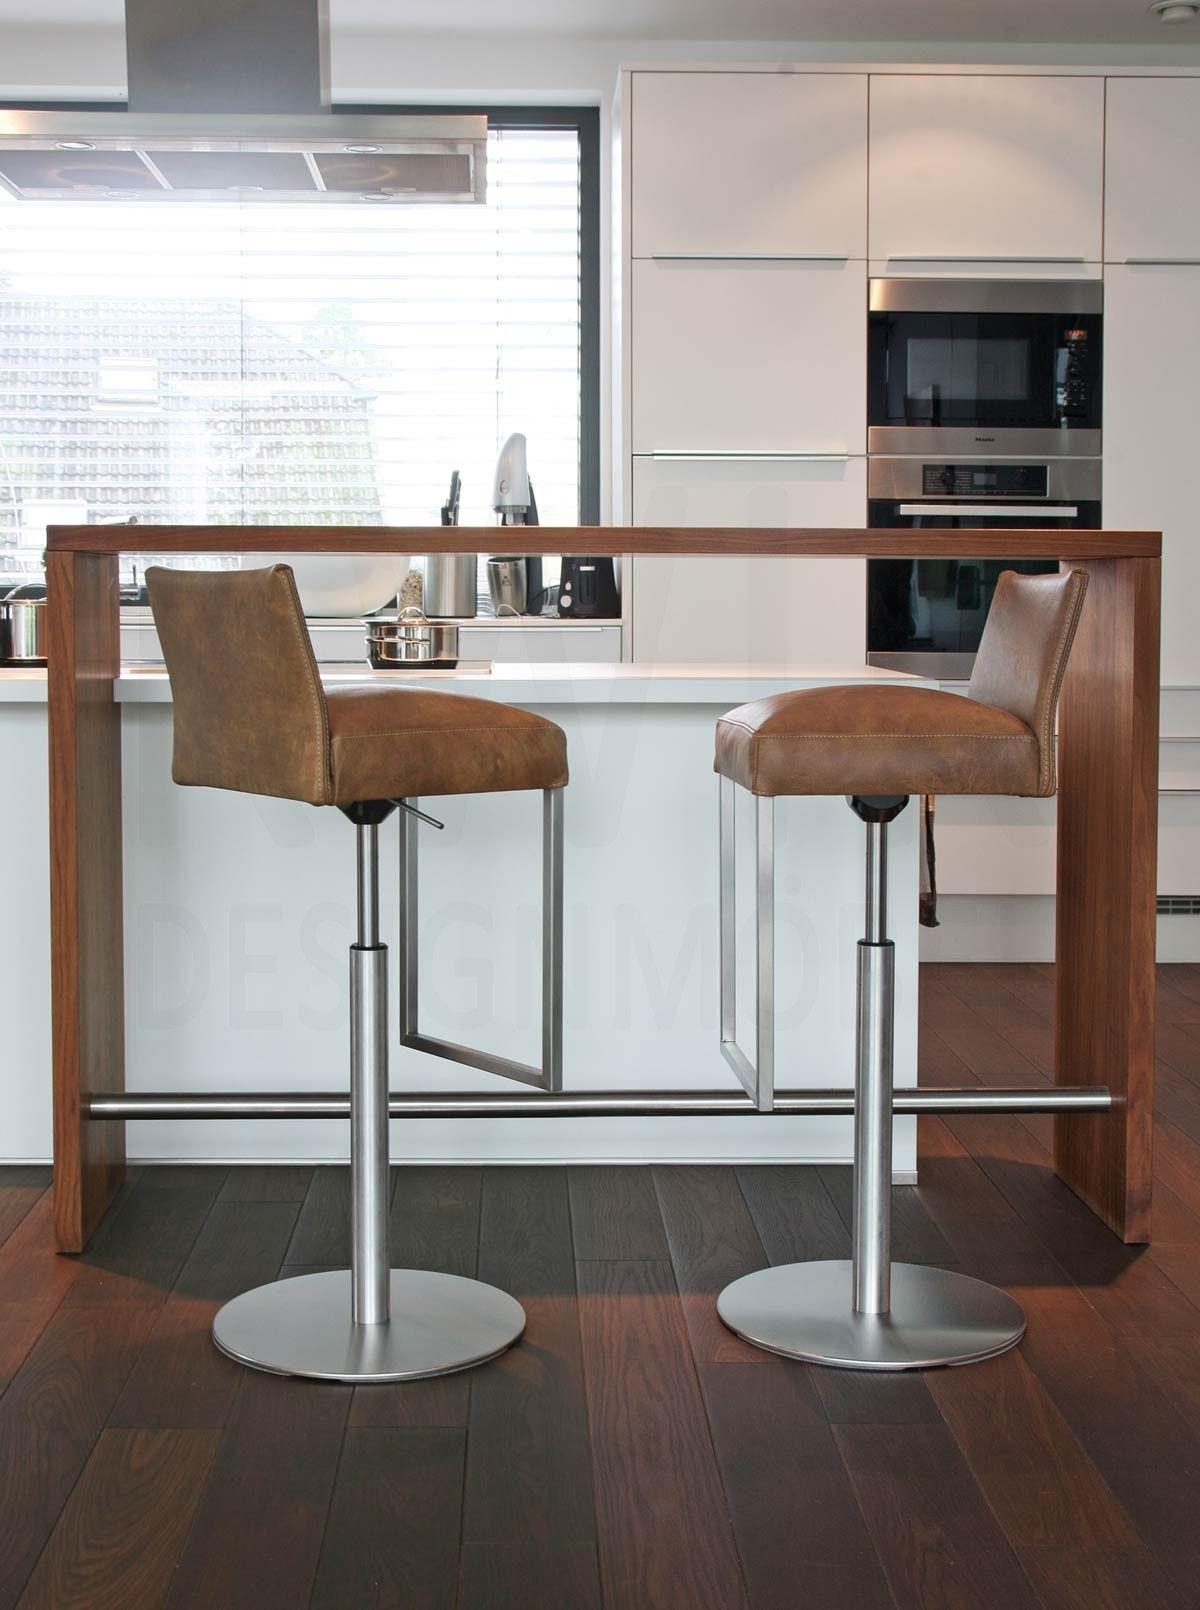 KFF Texas Exclusiv - Drehbarhocker • KFF®-Shop • KwiK Designmöbel ...